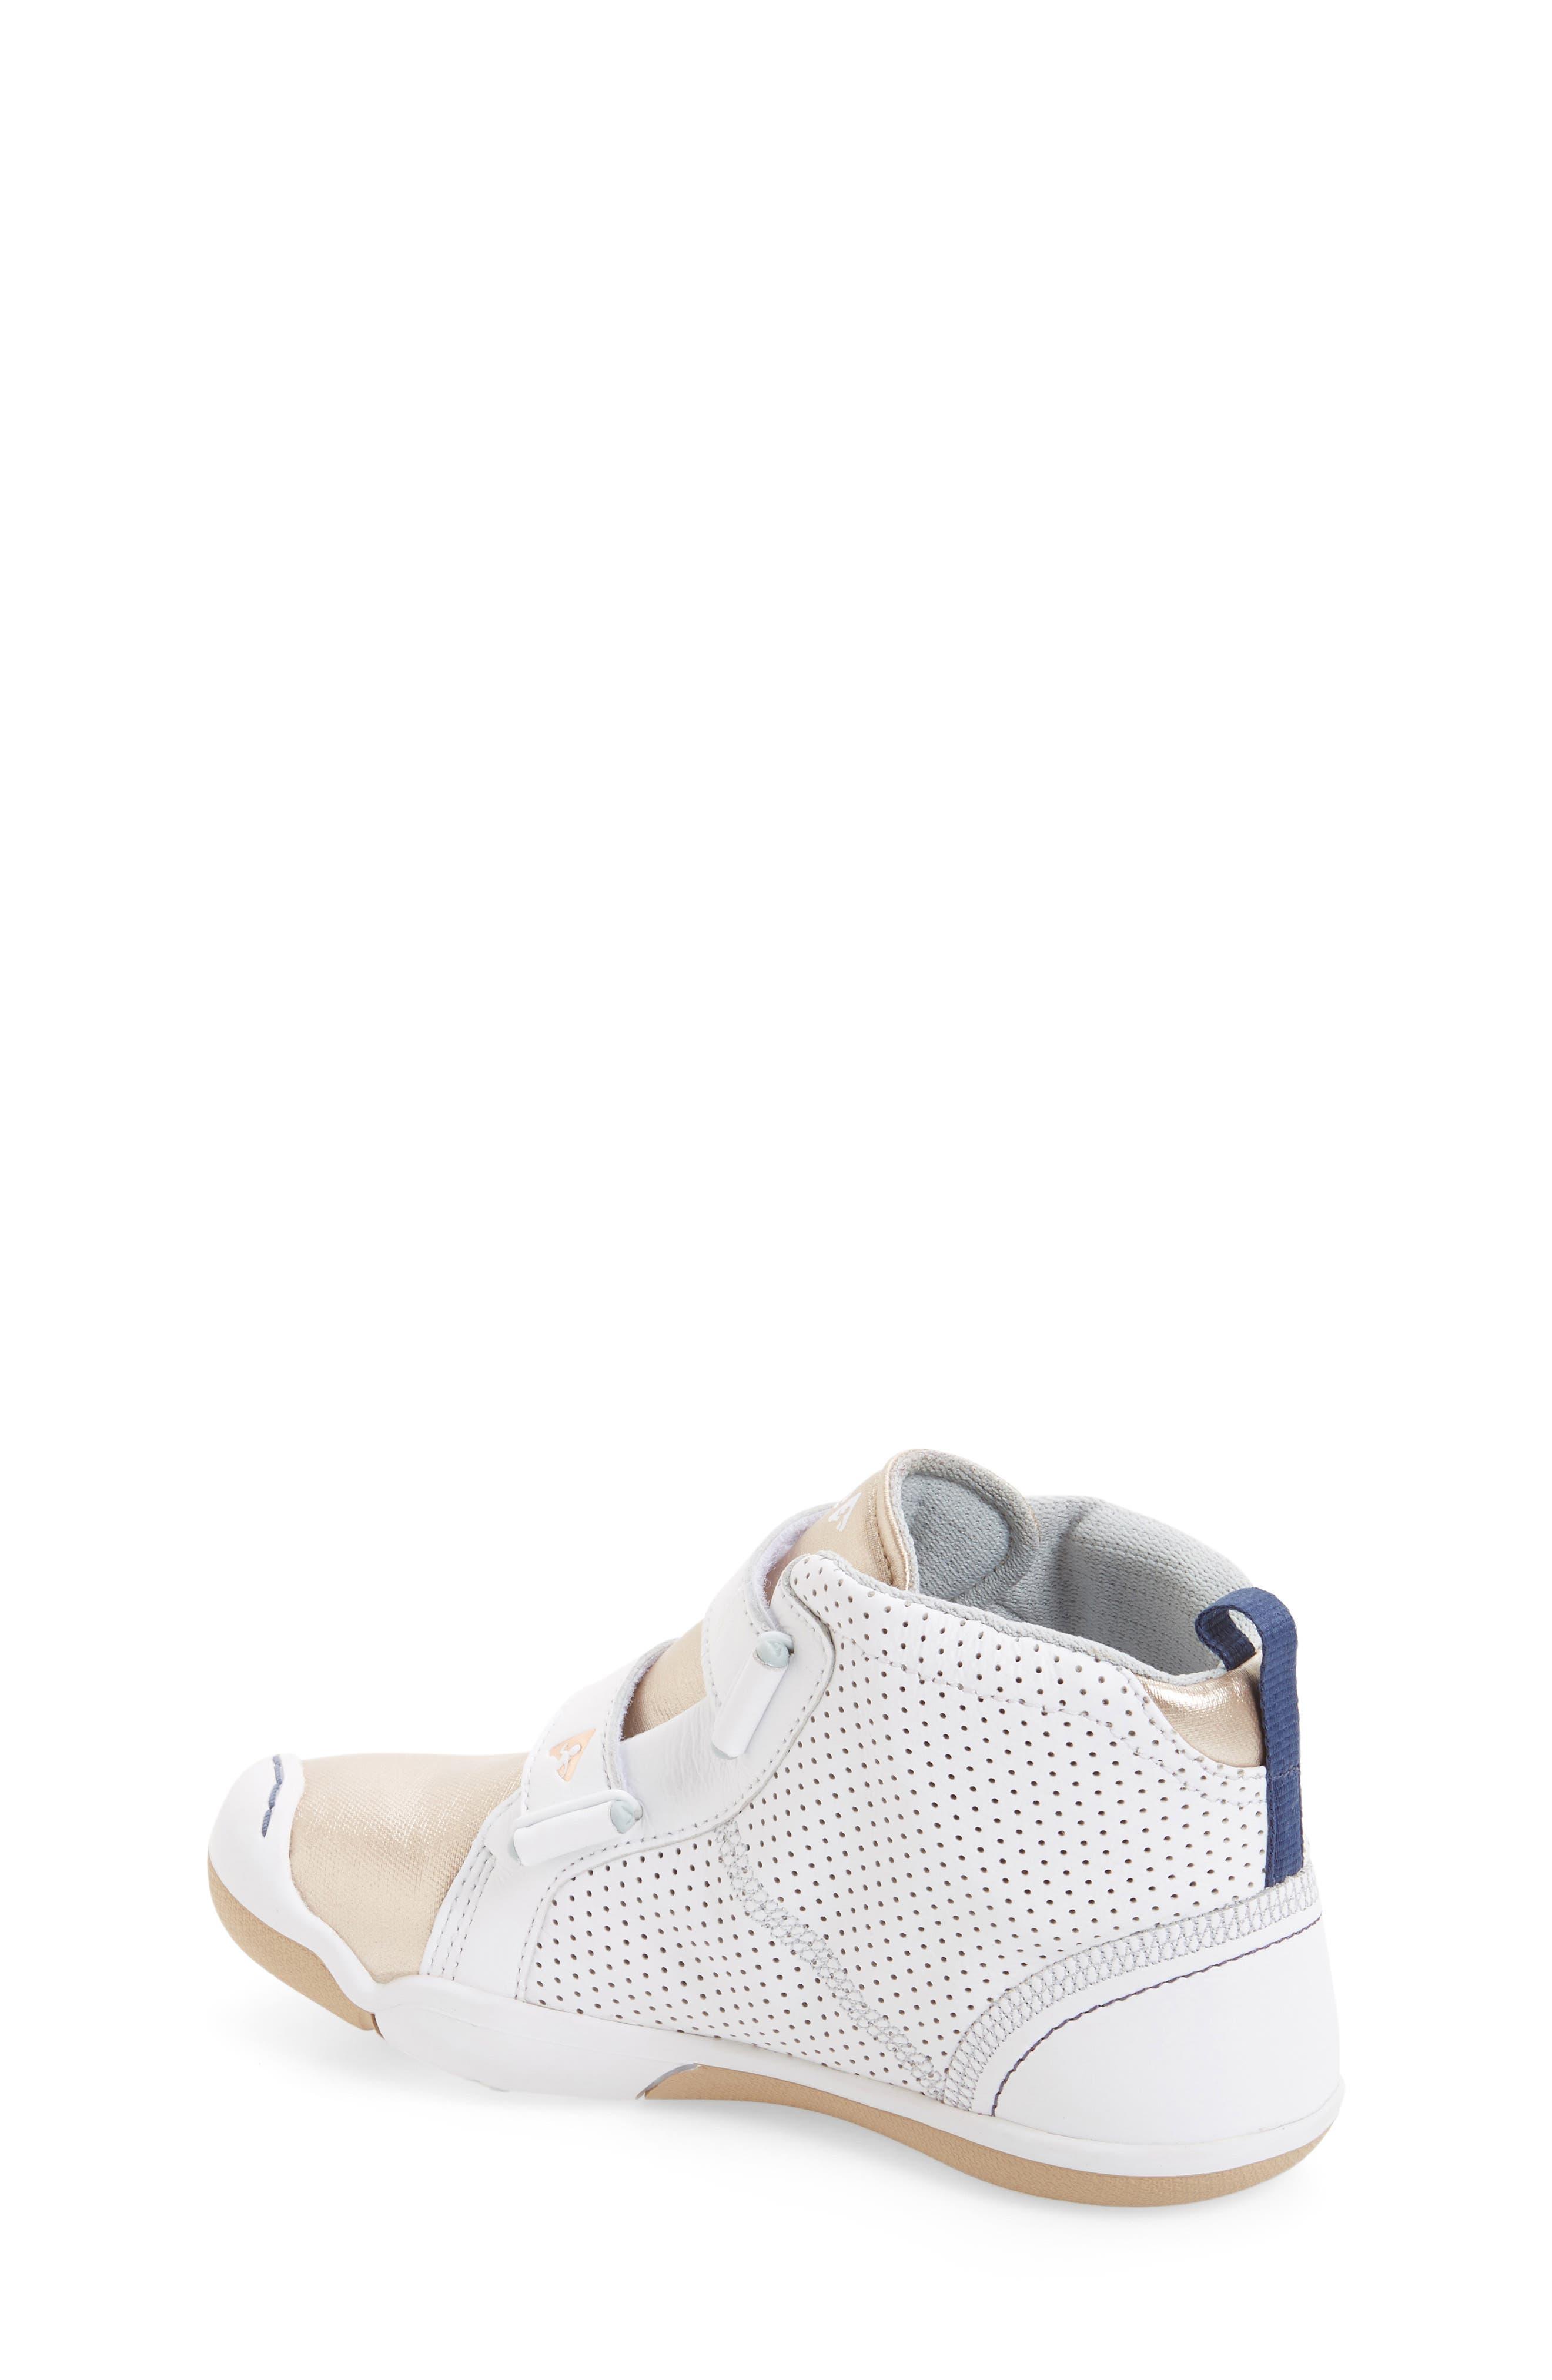 Max Customizable High Top Sneaker,                             Alternate thumbnail 2, color,                             710